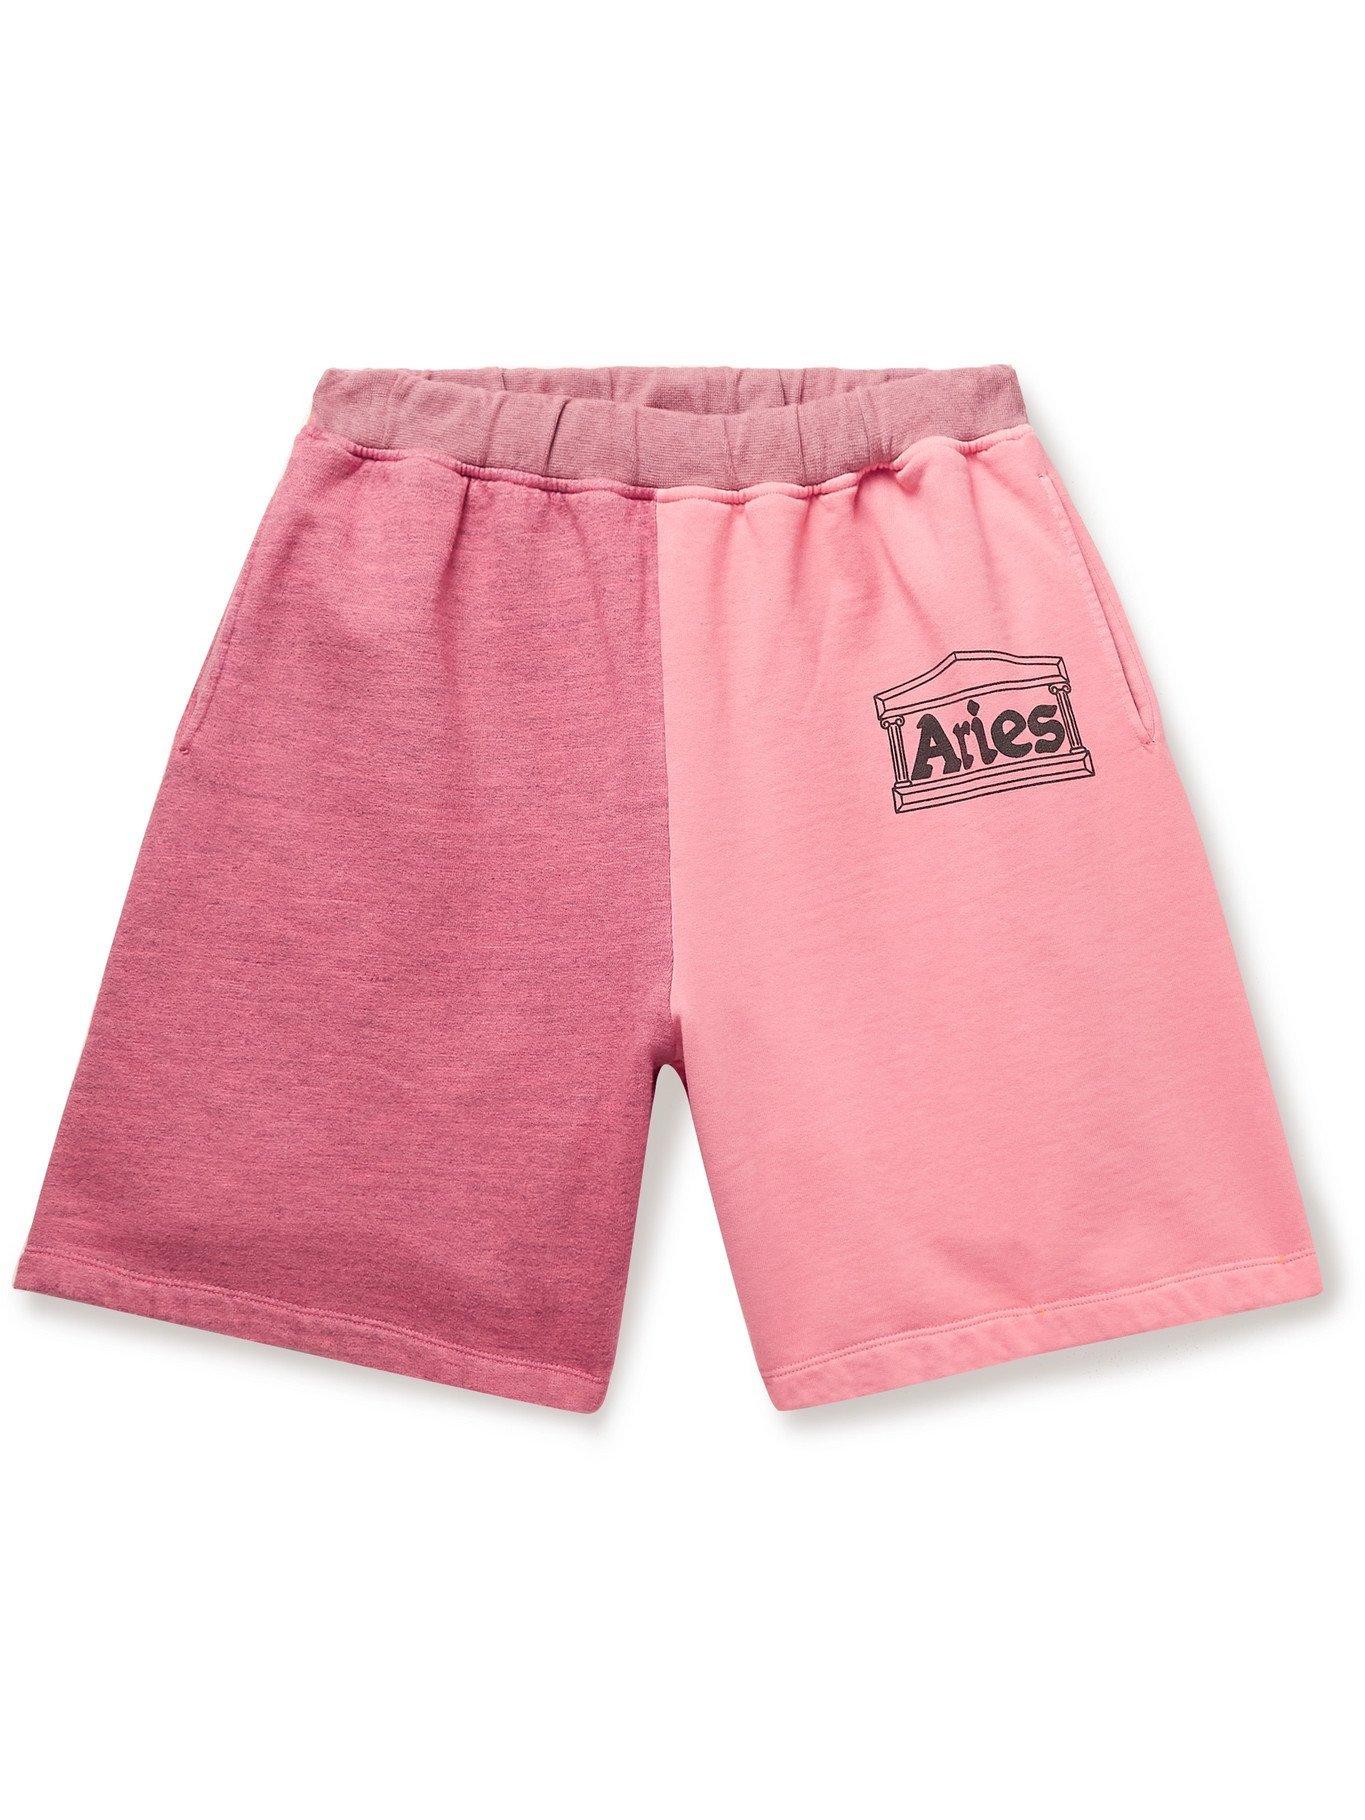 ARIES - Panelled Logo-Print Fleece-Back Cotton-Jersey Shorts - Pink - L